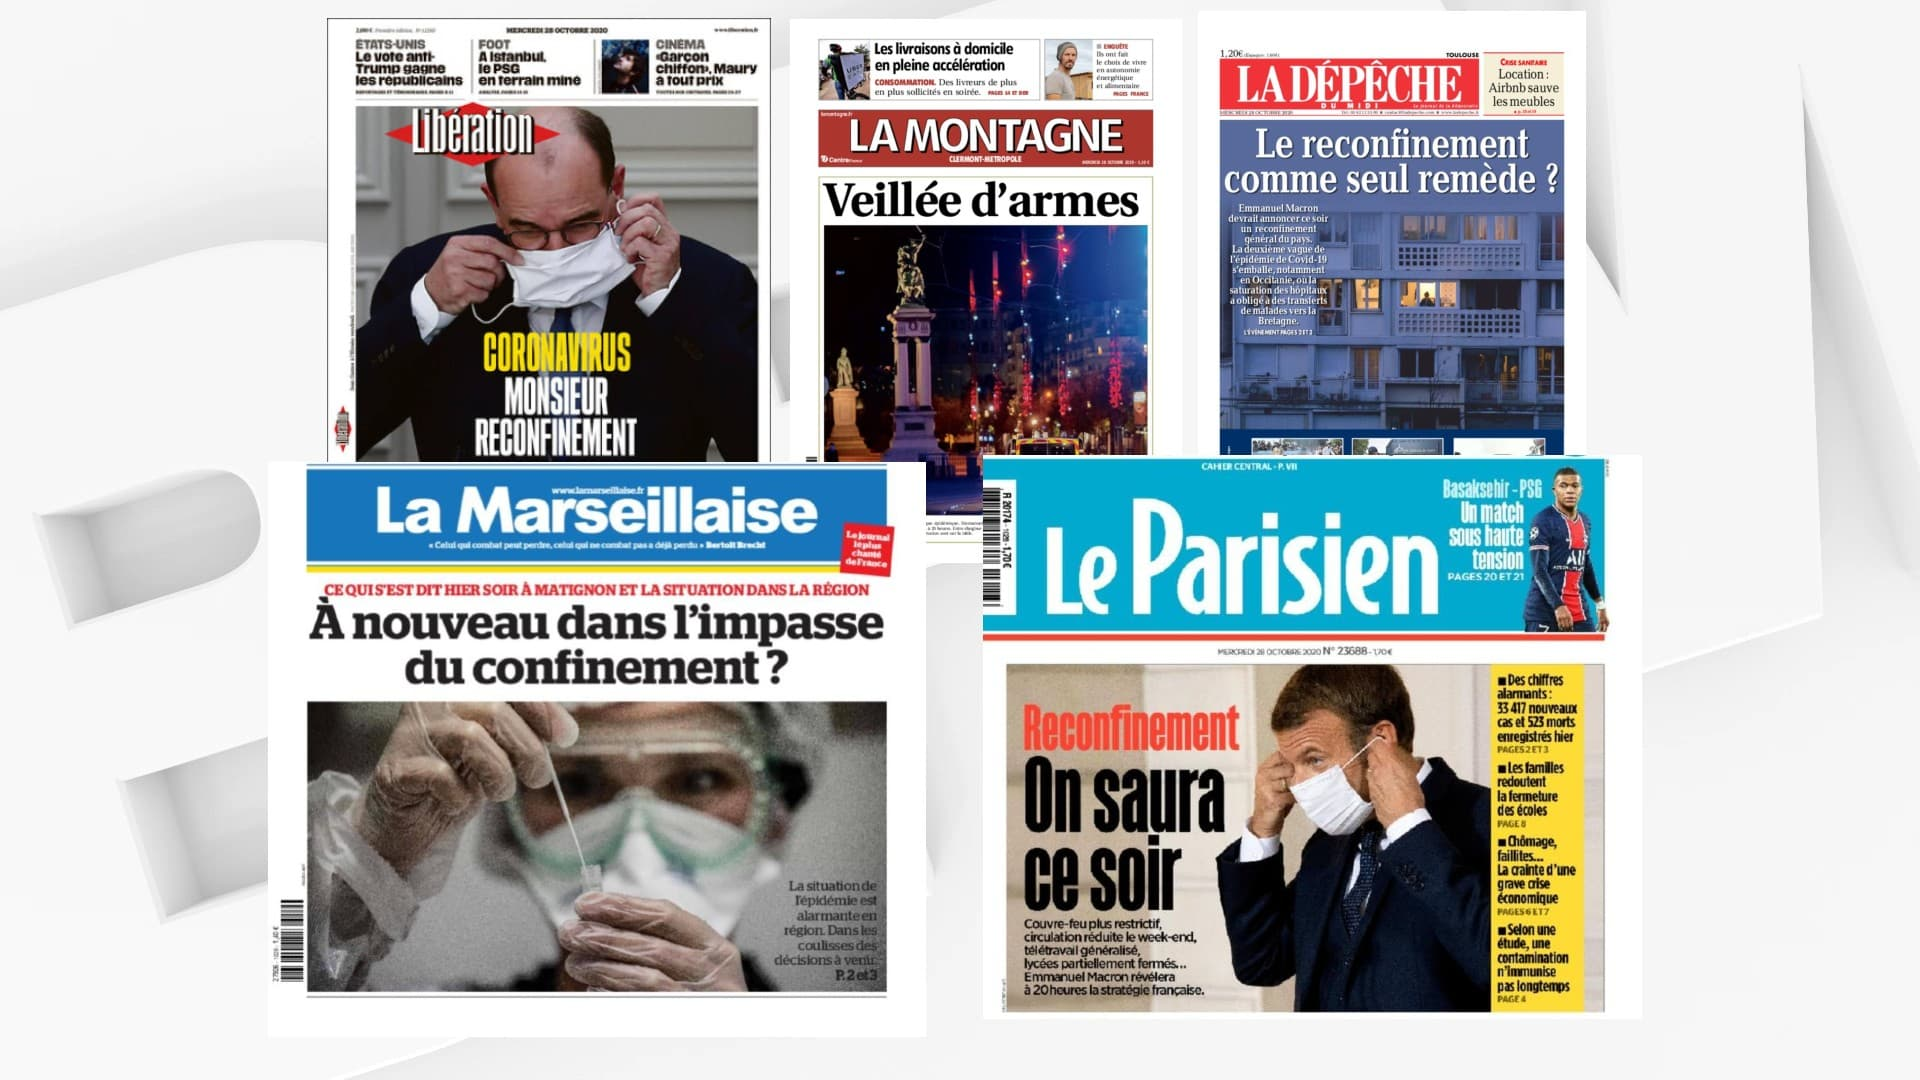 Direct Coronavirus Covid 19 France Confinement Reconfinement Emmanuel Macron 20h Discours Allocution Ecole College Lycee Magasin Carte Bilan Cas Mort Vaccin